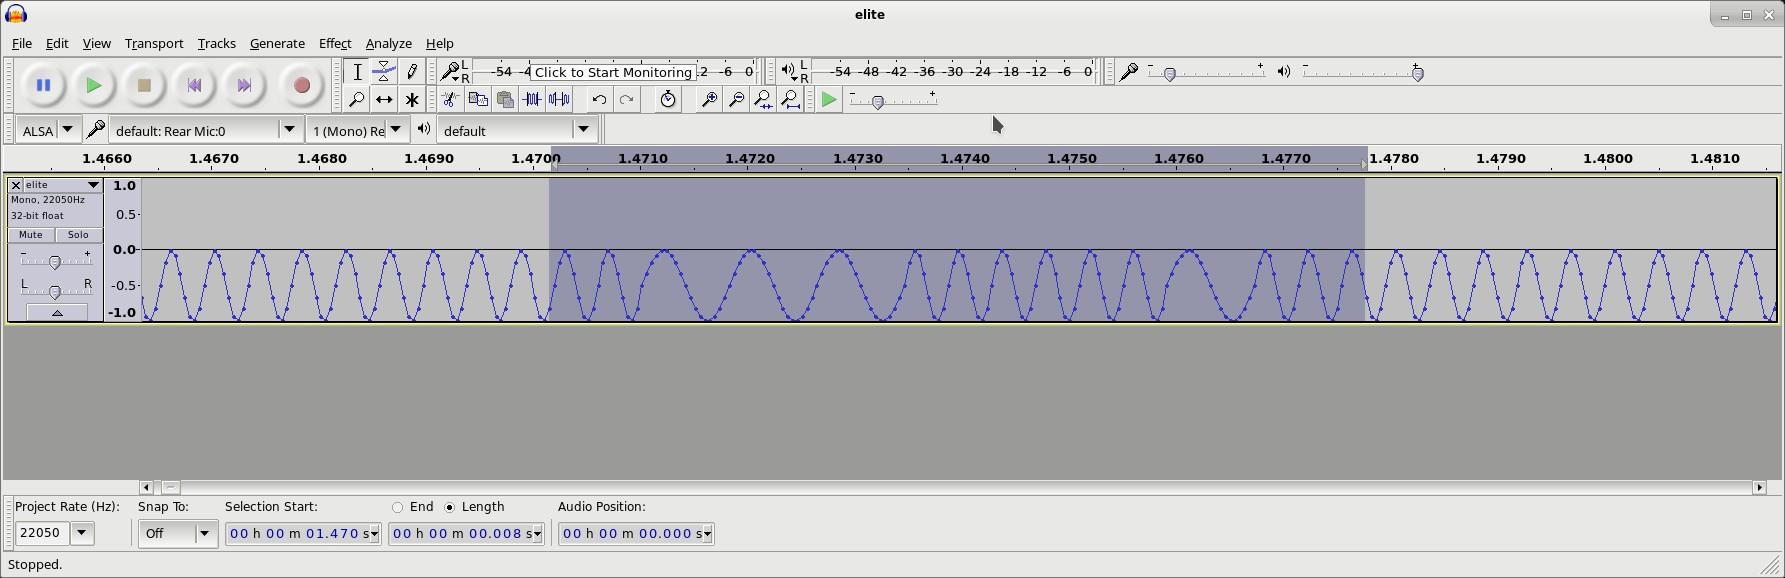 Electron Tape Waveform